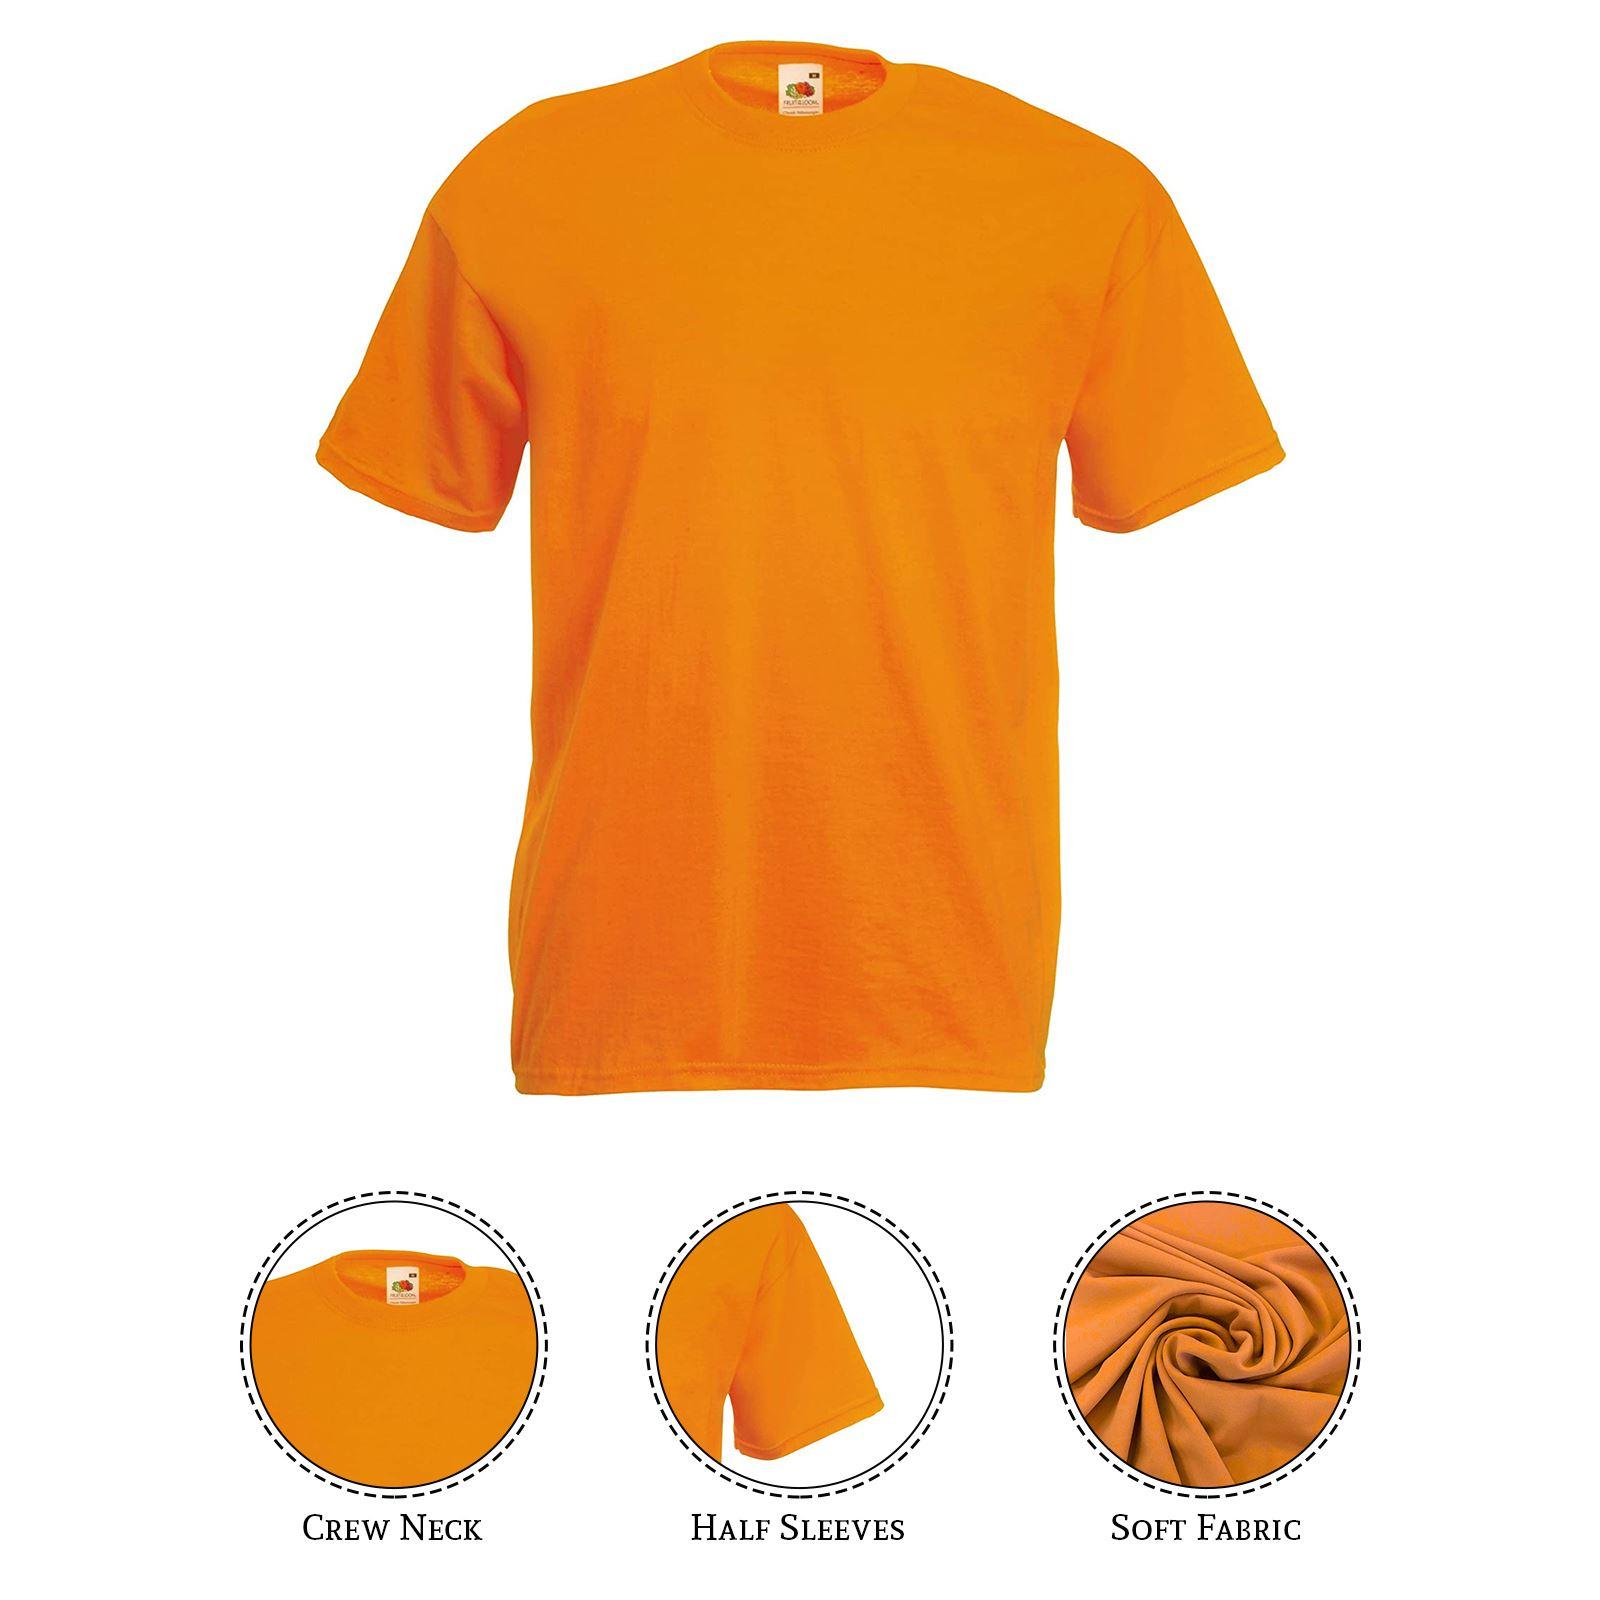 thumbnail 3 - Men-s-Fruit-Of-The-Loom-T-Shirt-Original-100-Cotton-Casual-Plain-Top-Tee